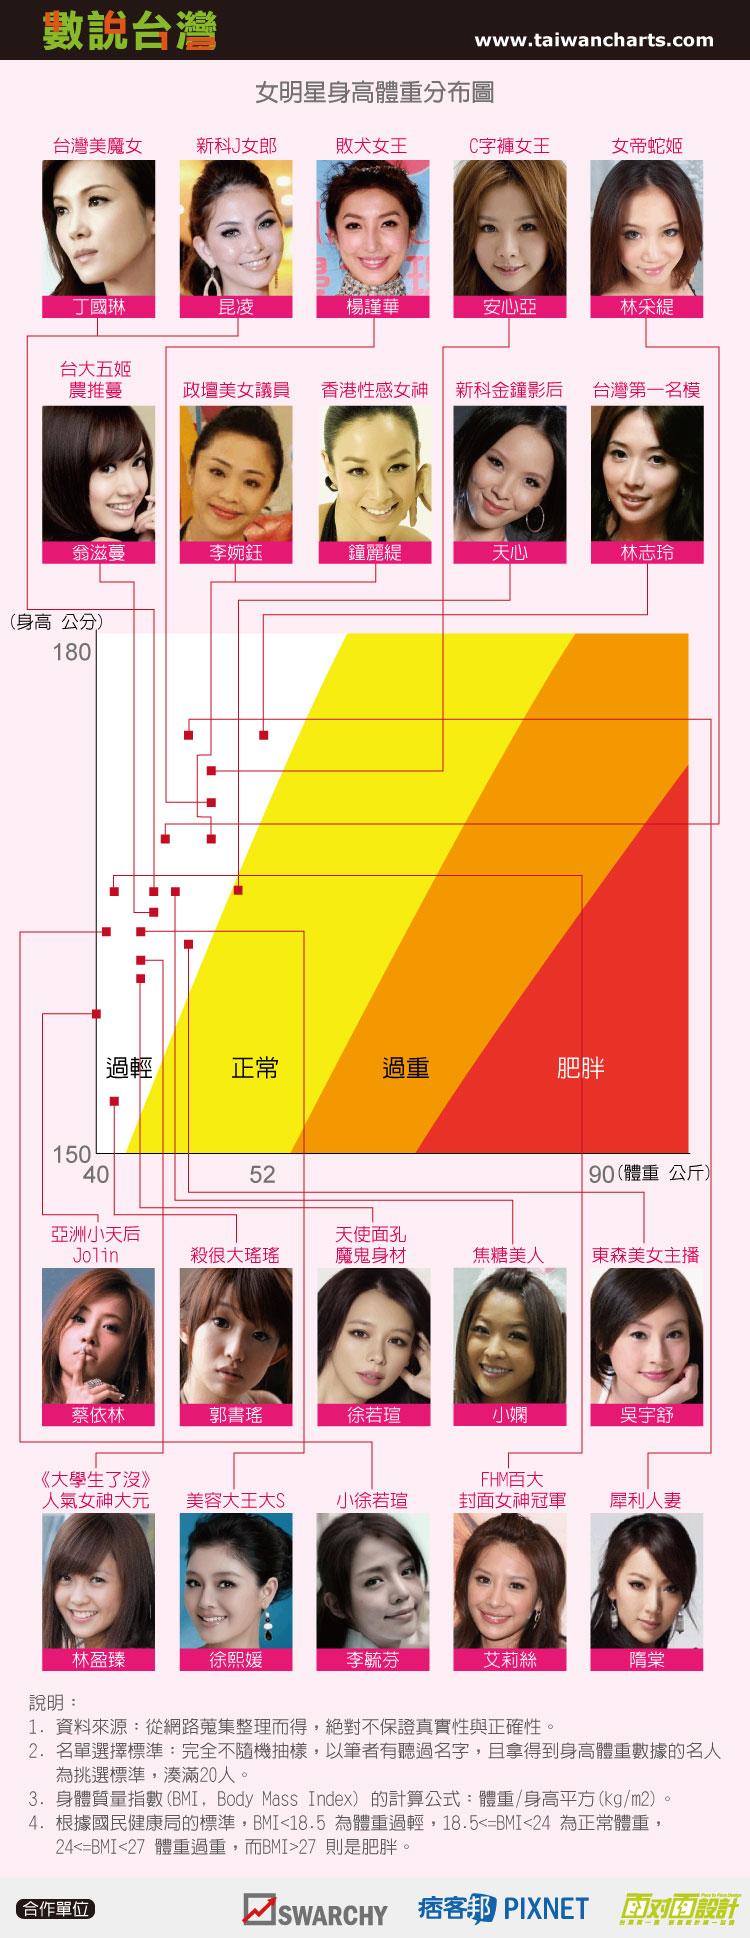 BMI_Female Celebrities.jpg